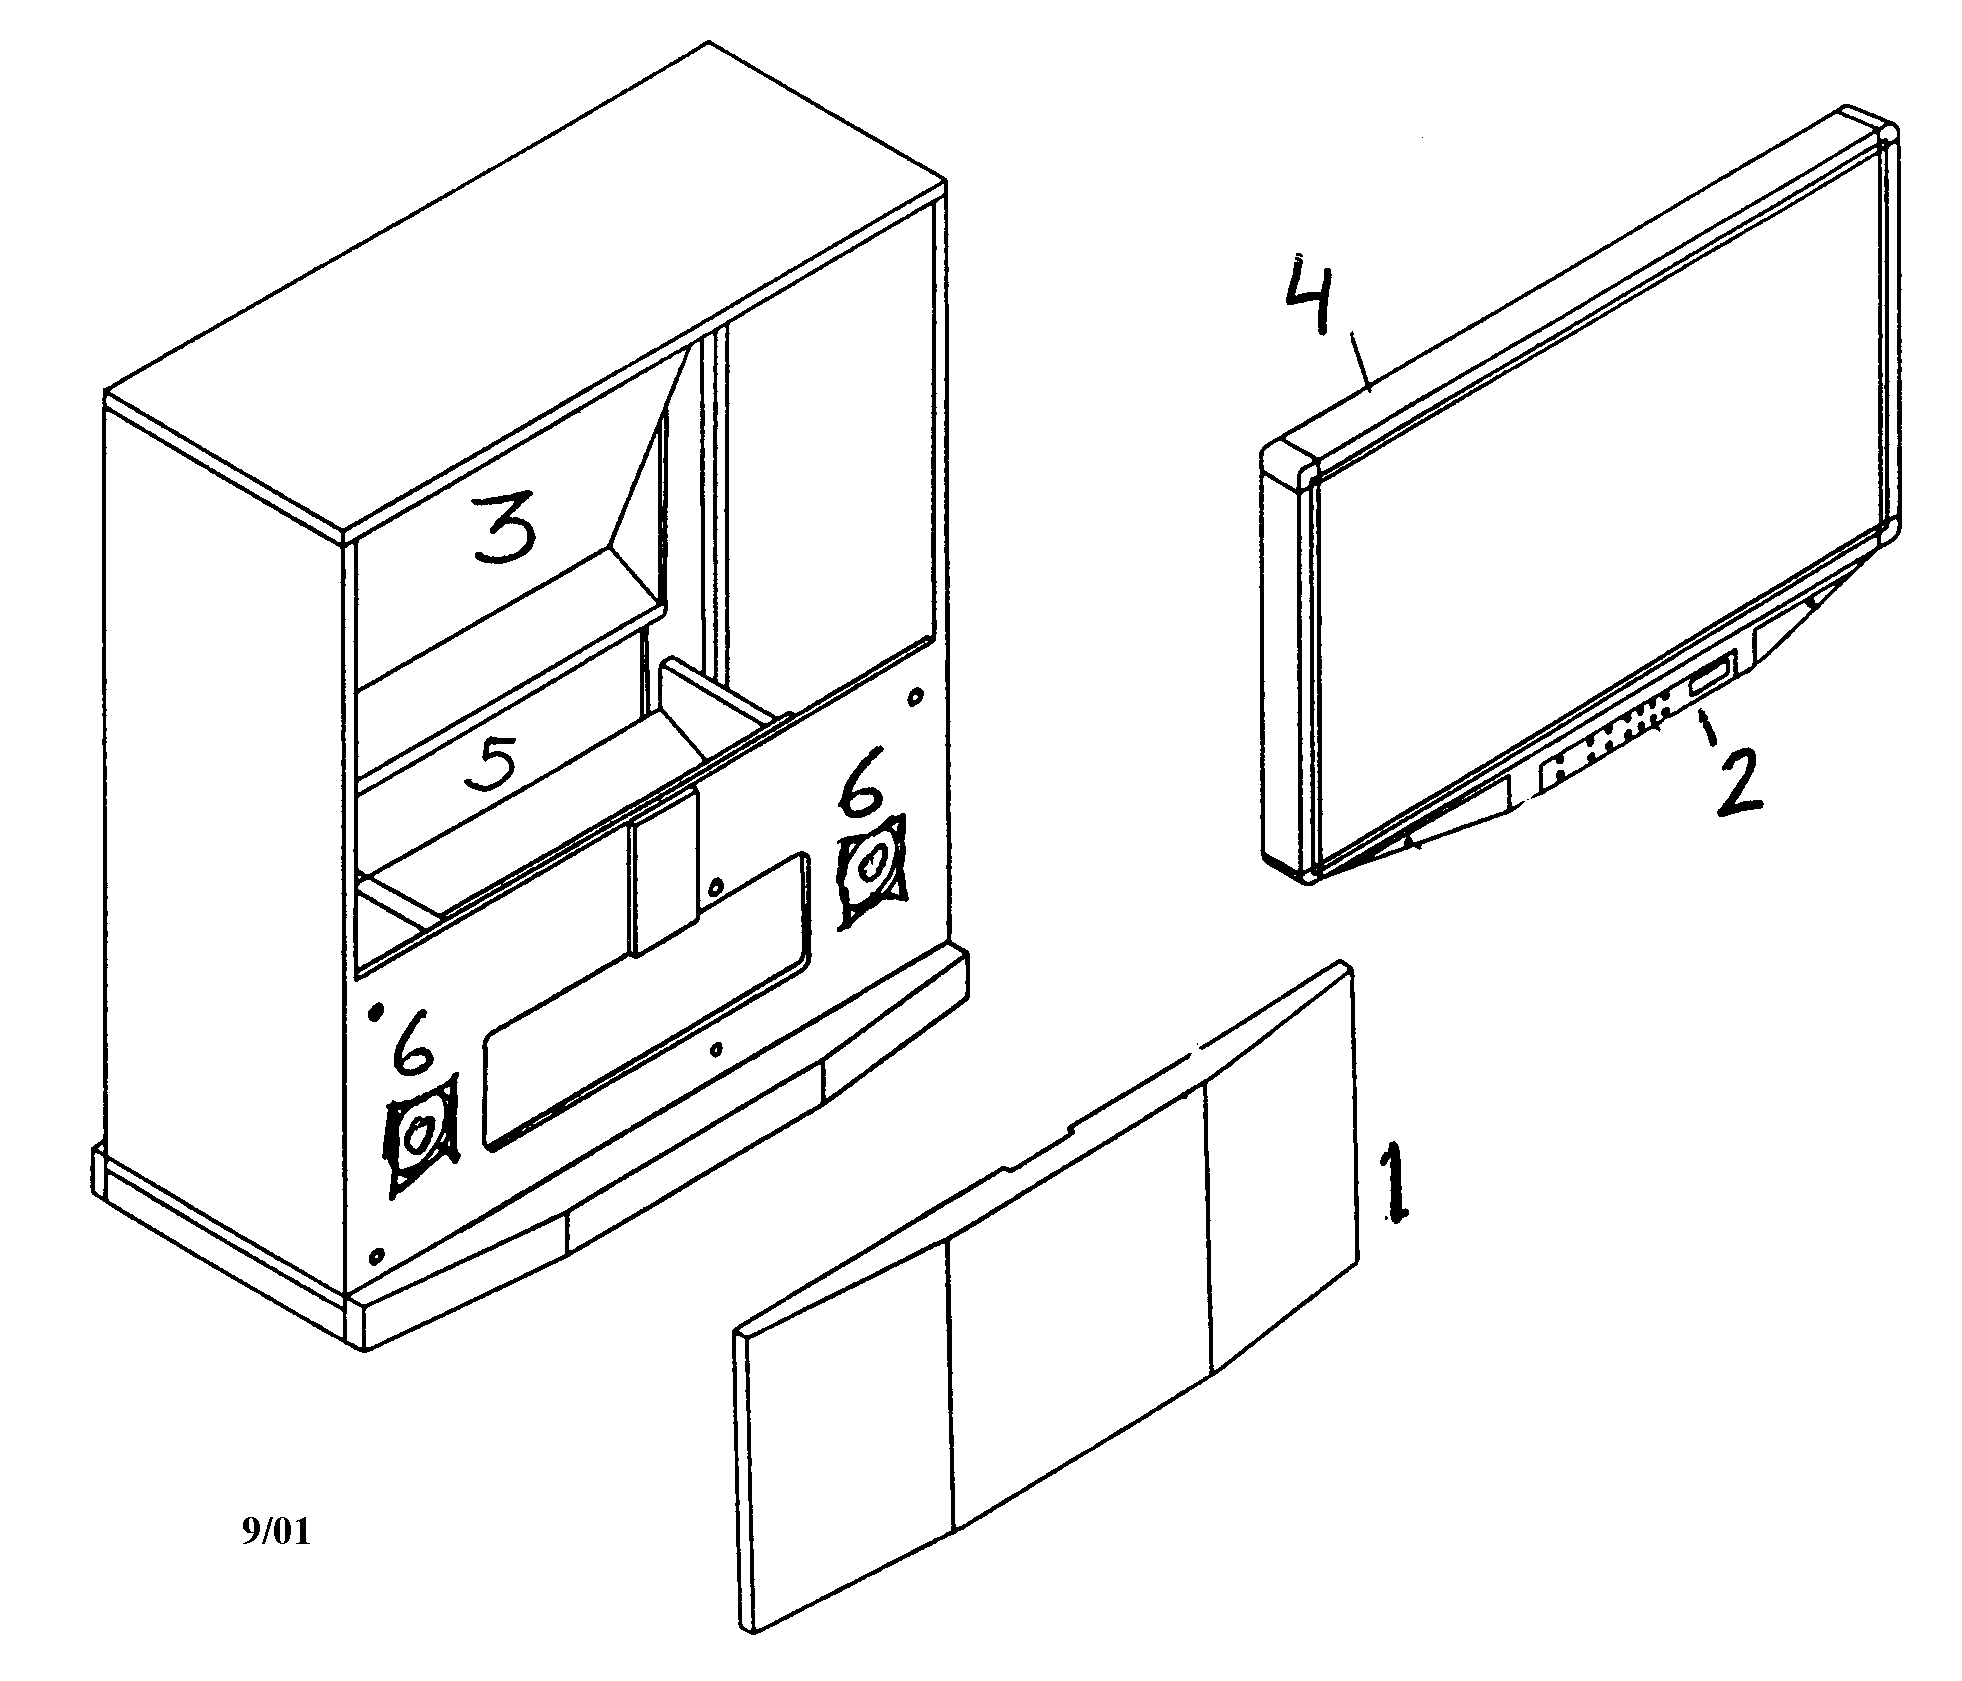 [DIAGRAM] Schematic Diagram Mitsubishi Tv In pdf and cdr